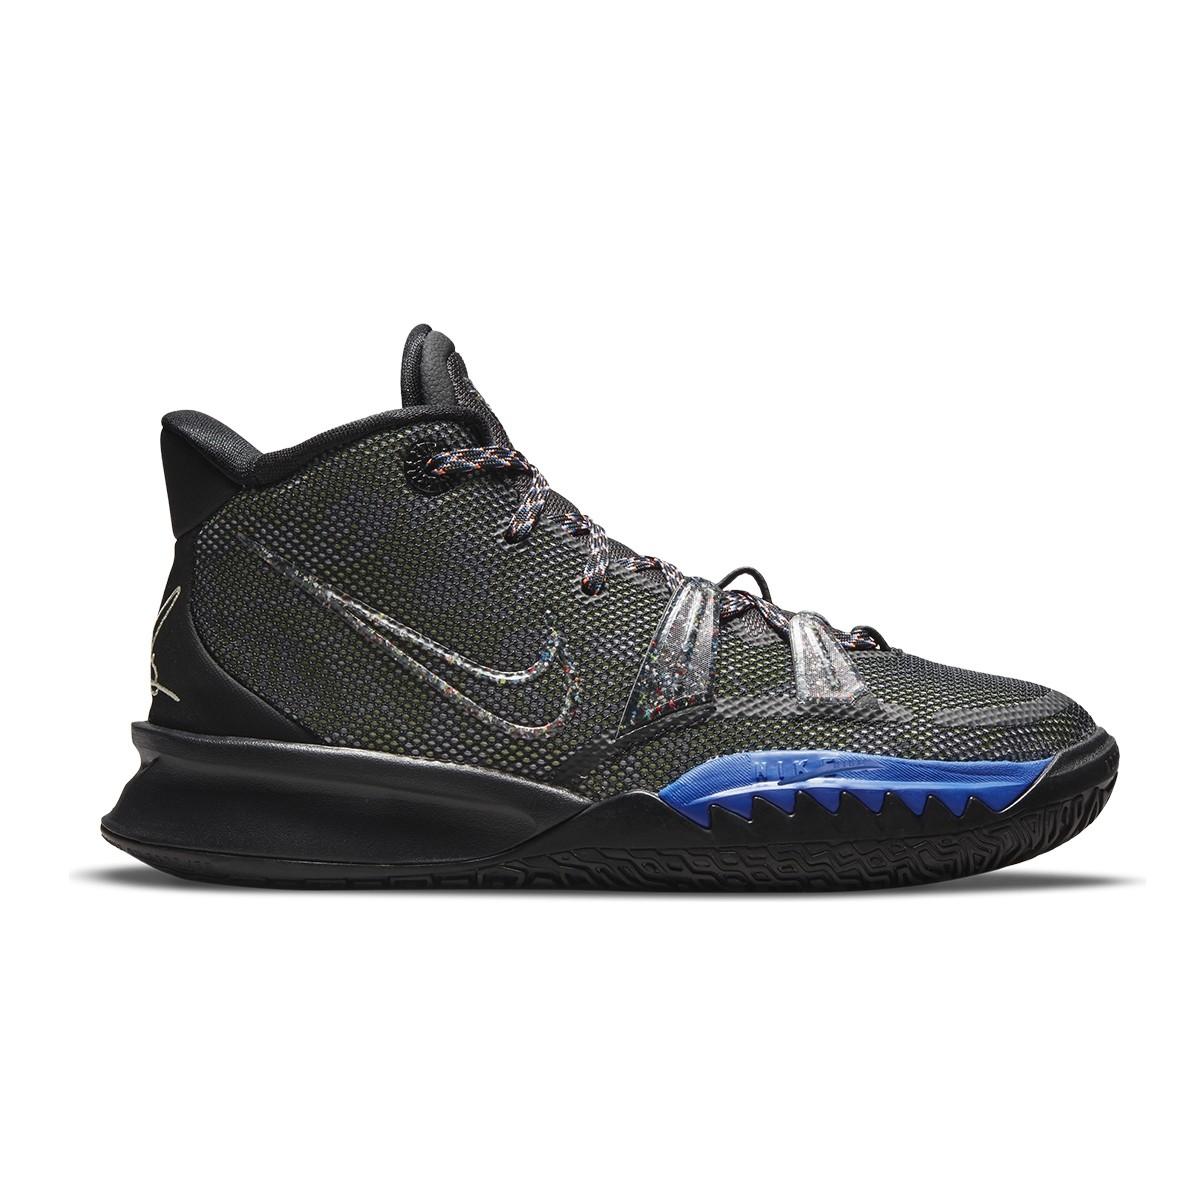 Nike Kyrie 7 Jr 'Black Lime'